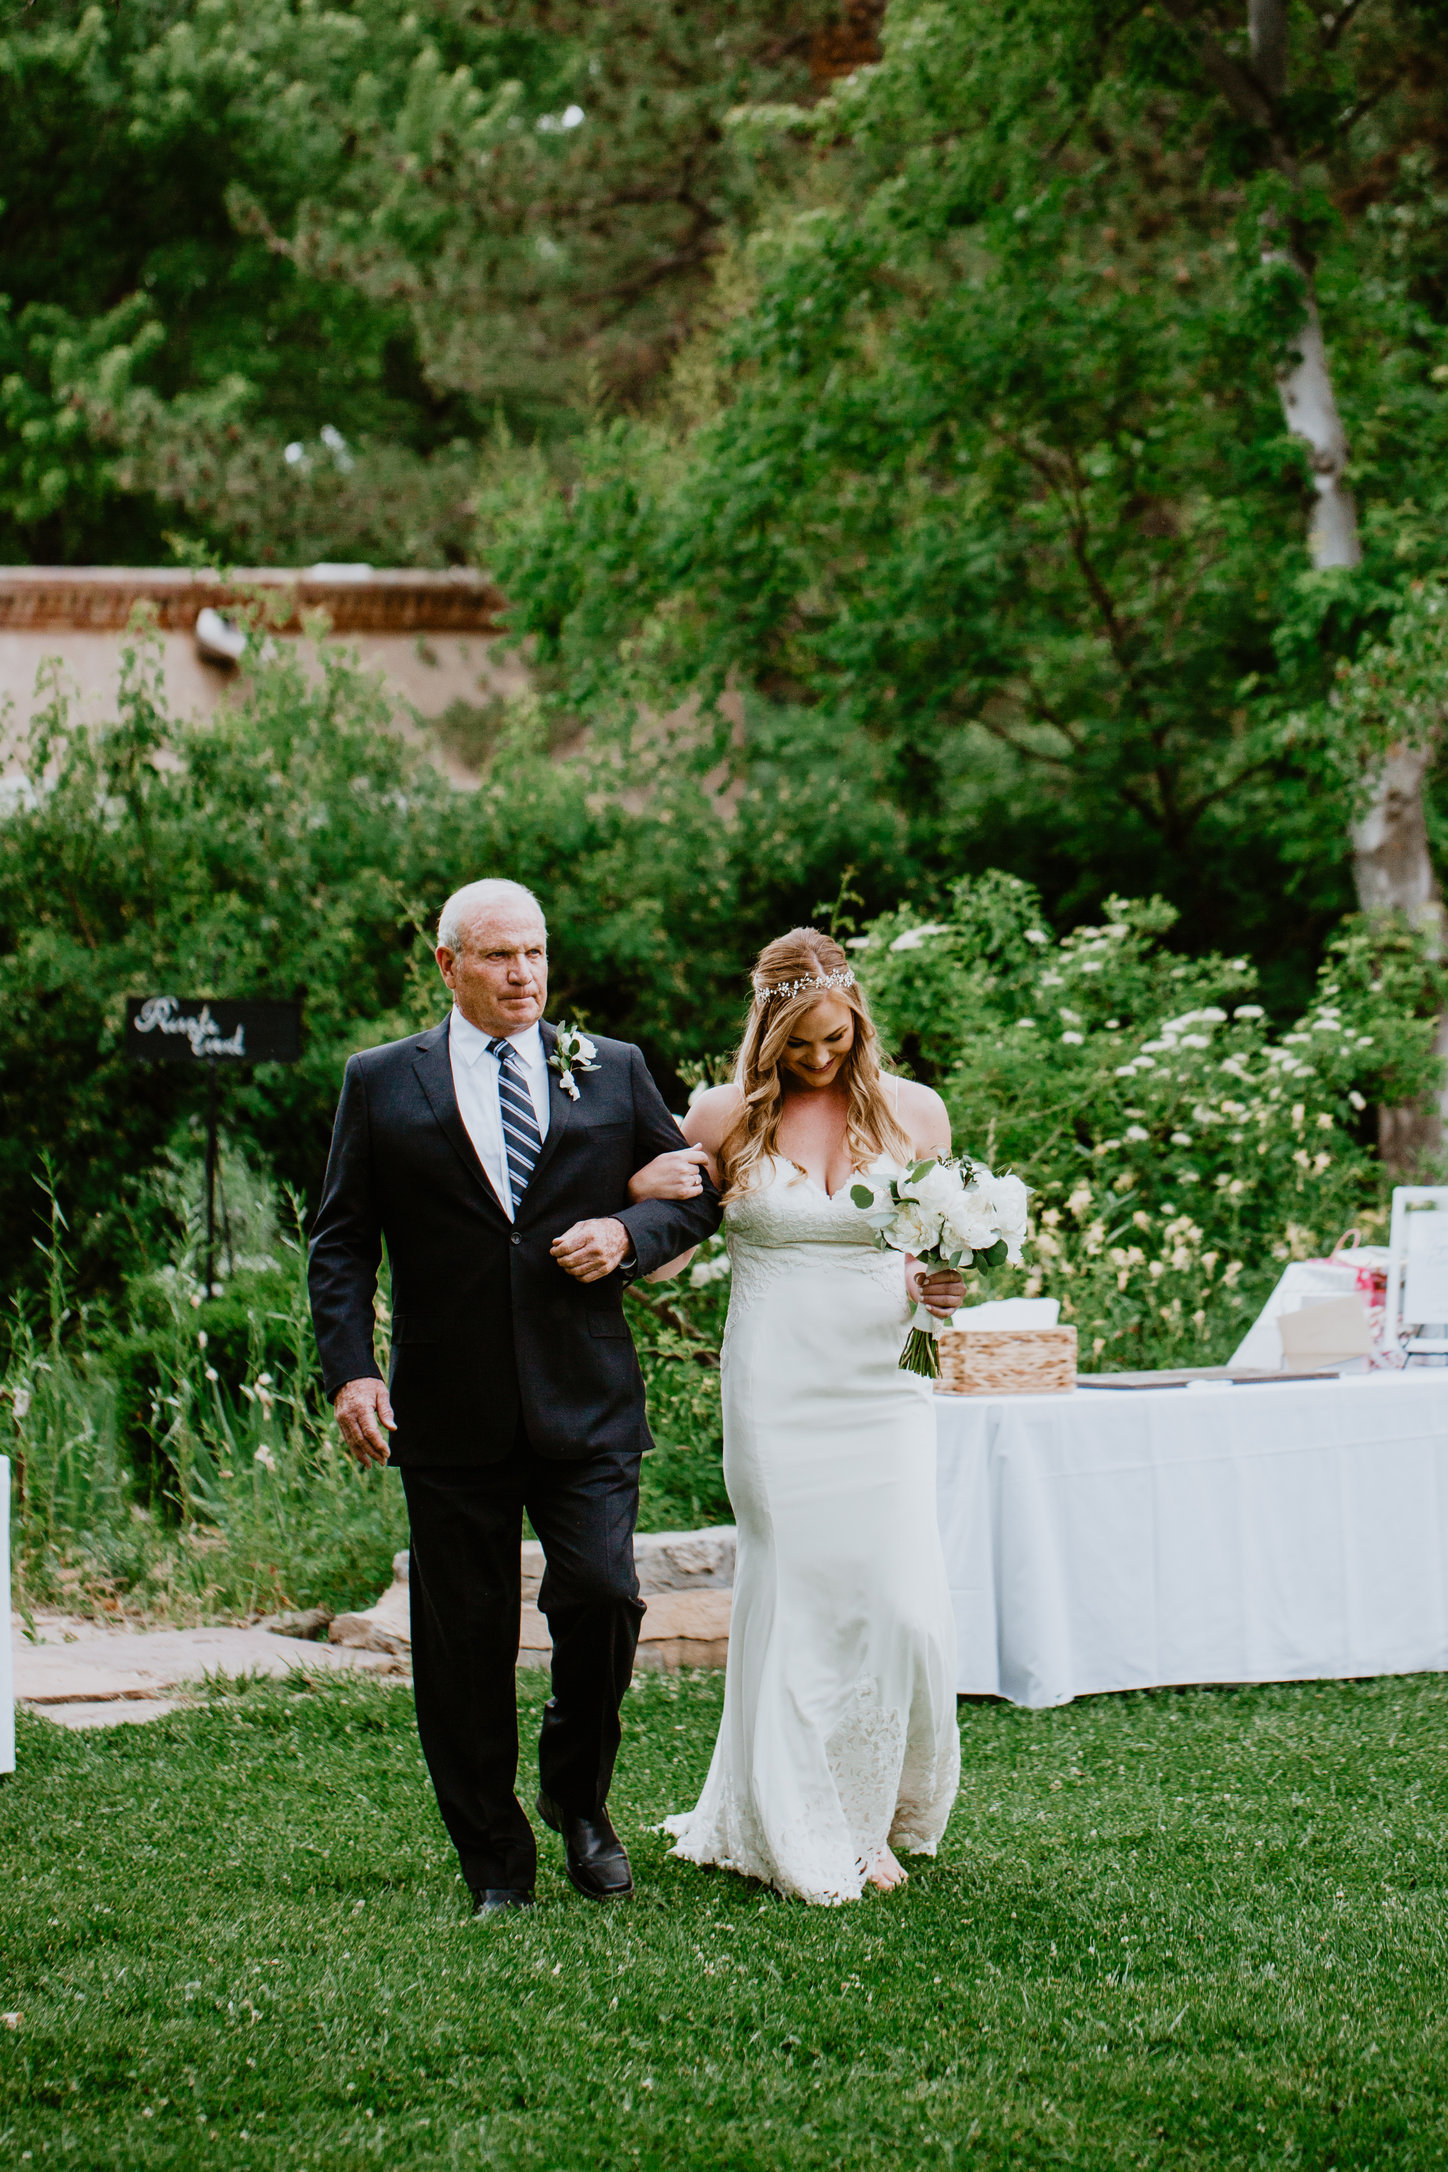 DandA-wedding-226.jpg